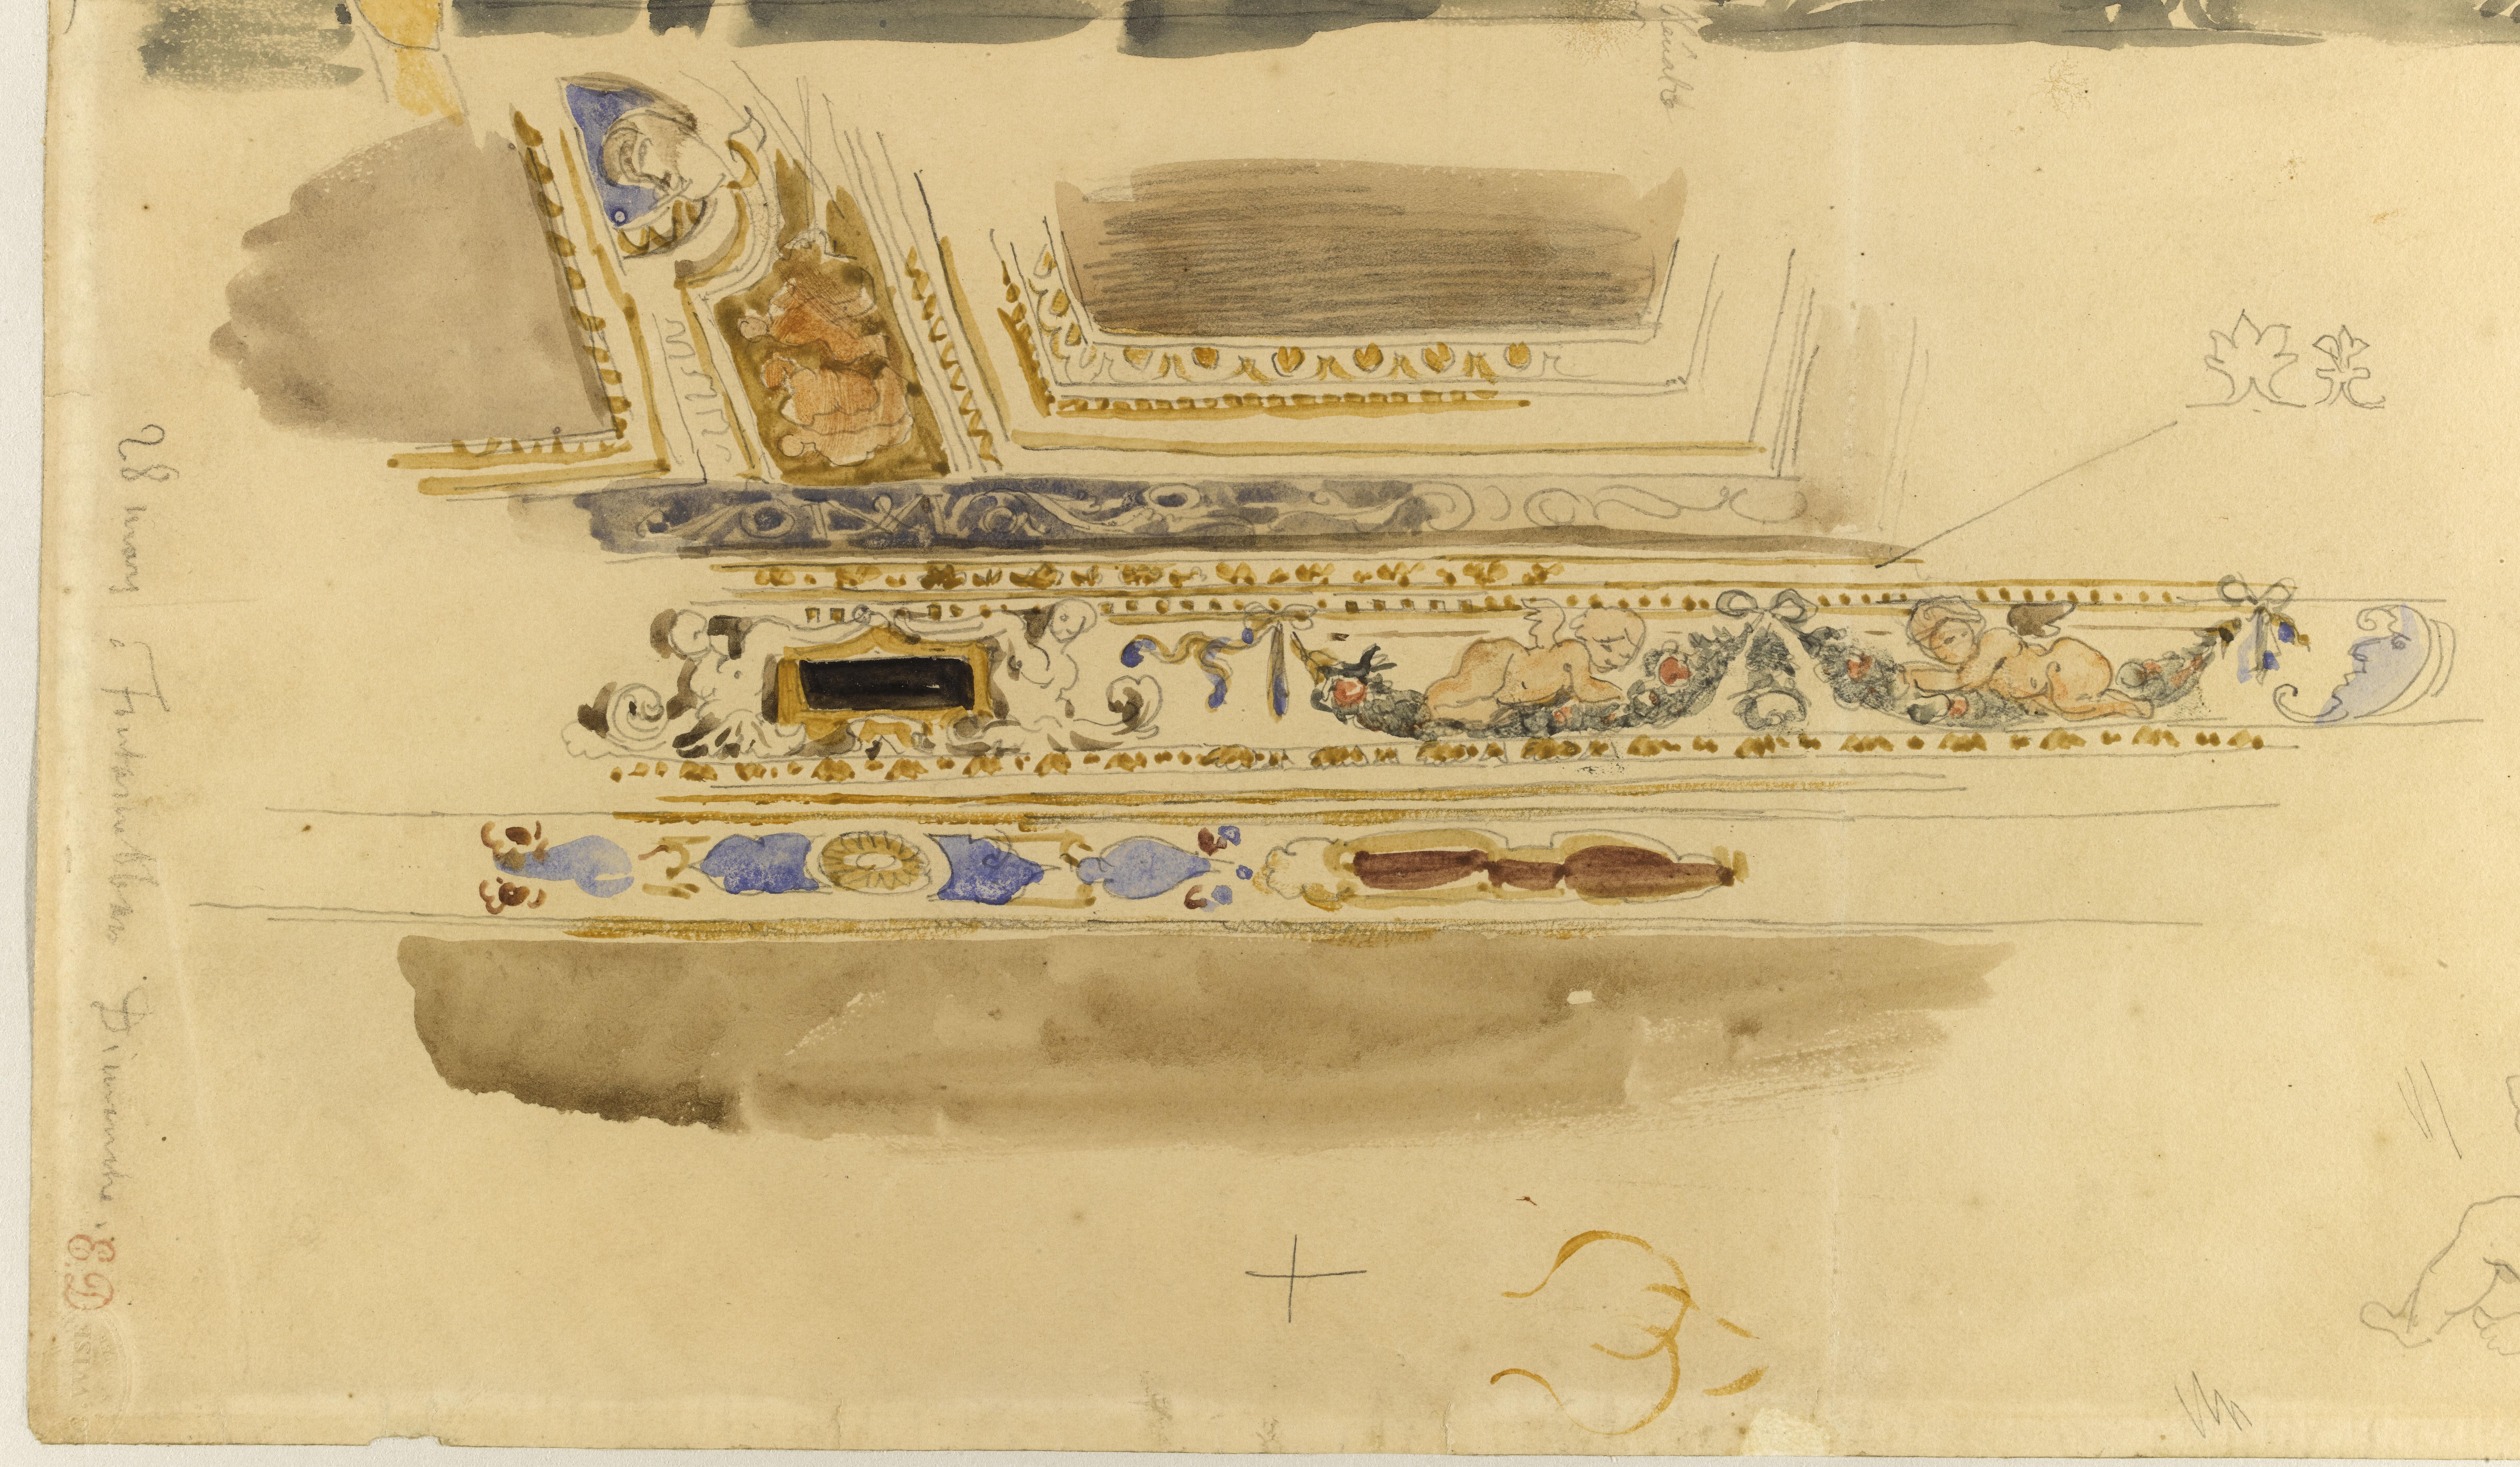 Study based on the décor of the Louis XIII salon - Château de Fontainebleau